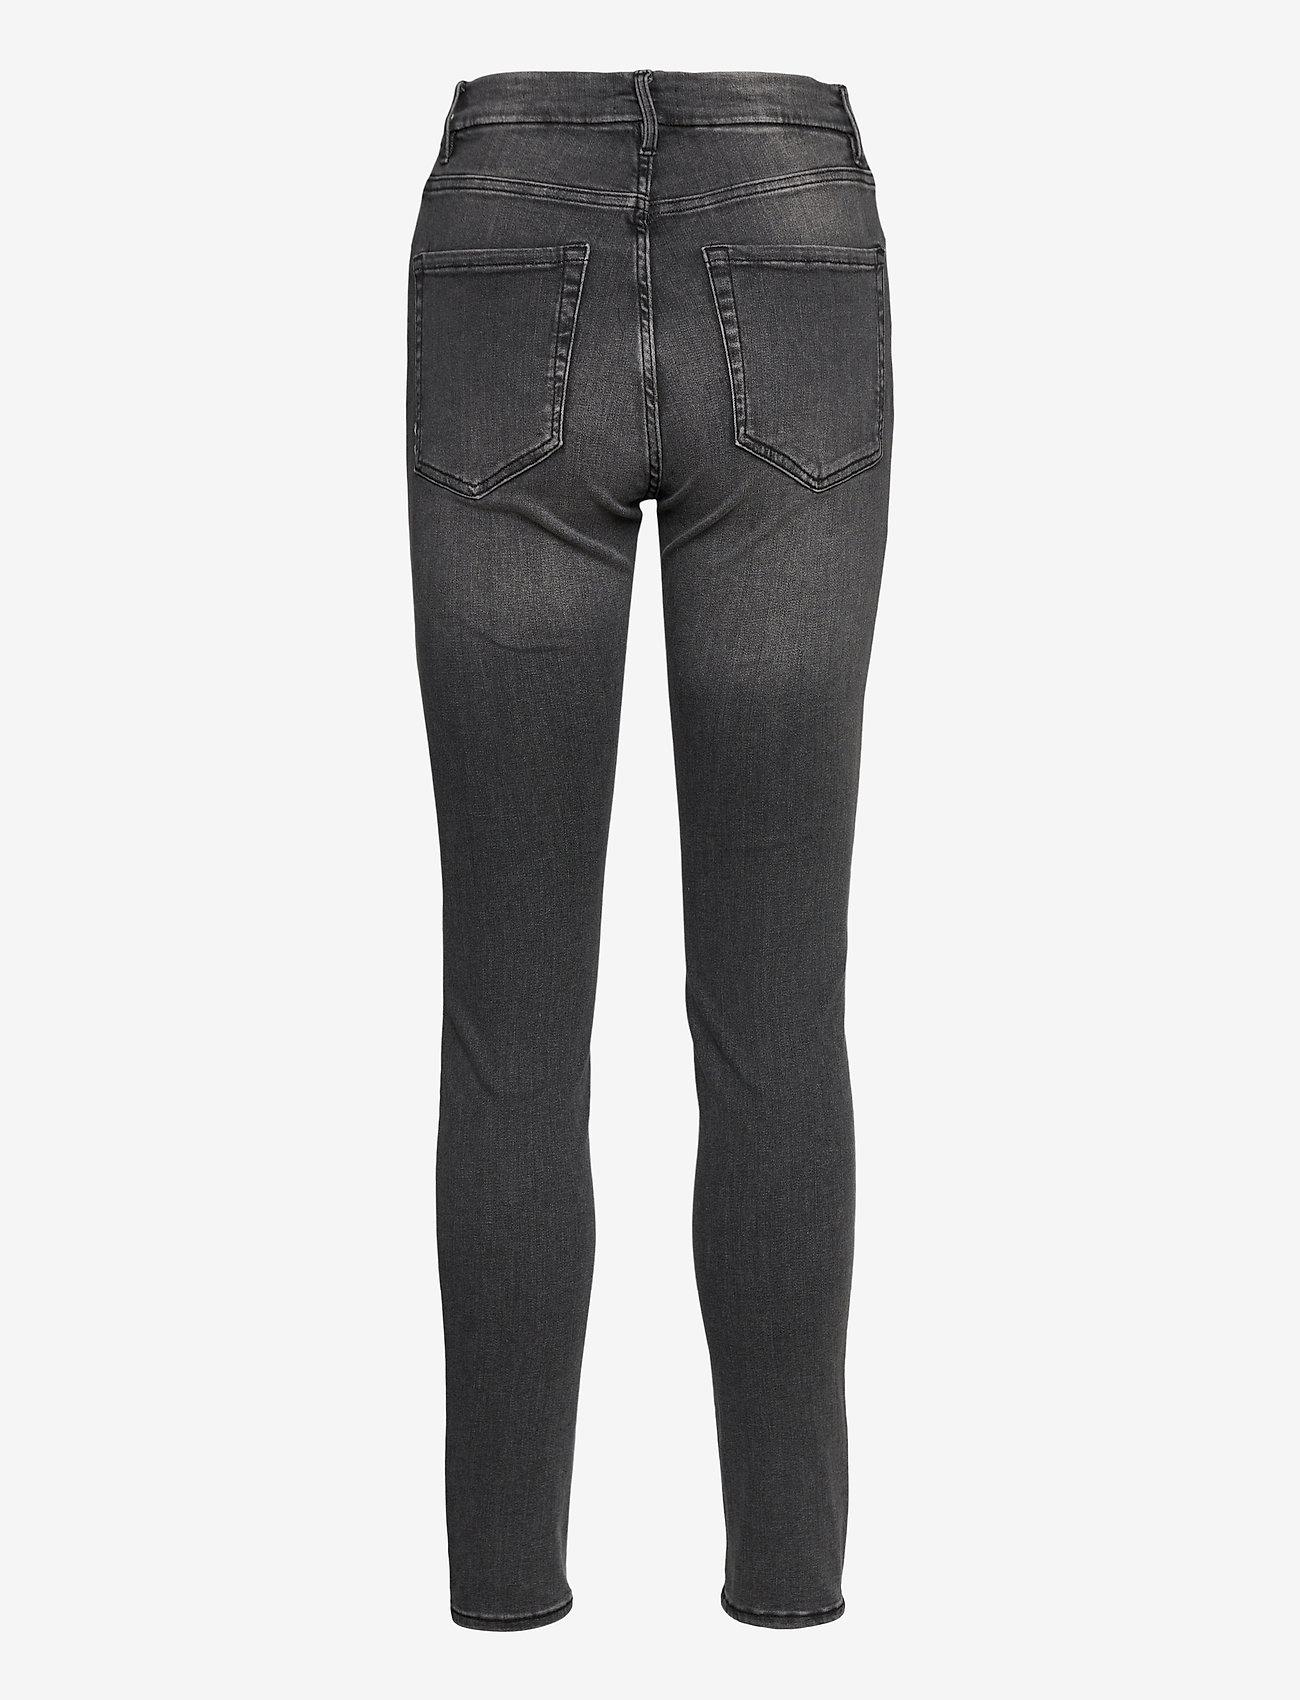 Lindex - Trousers denim Clara black - skinny jeans - black - 1